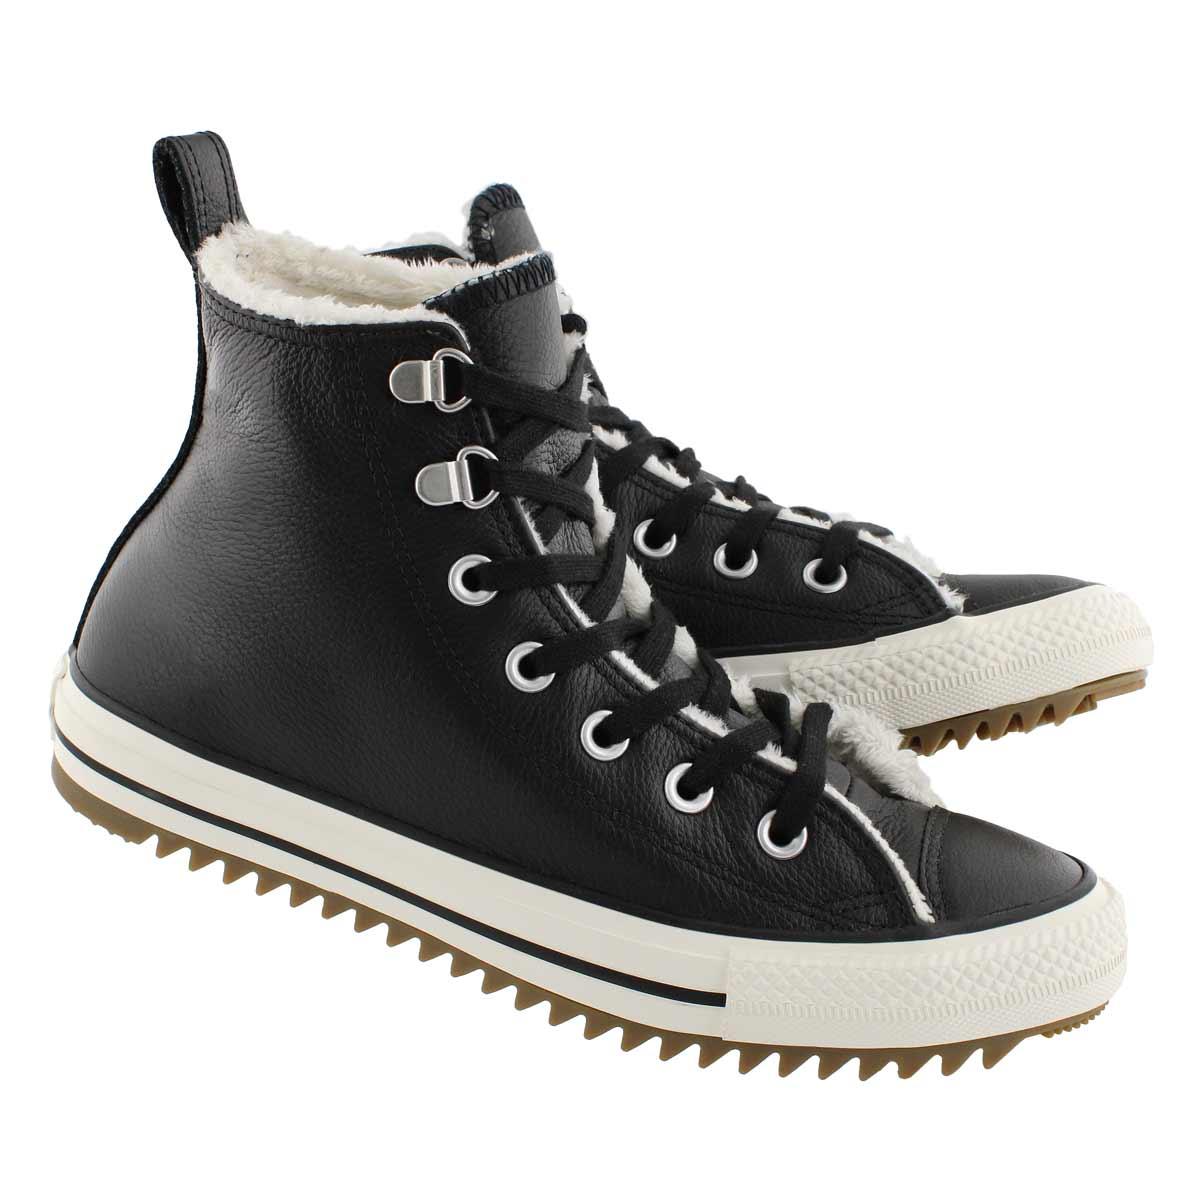 Lds CTAS Hiker blk/egret boot